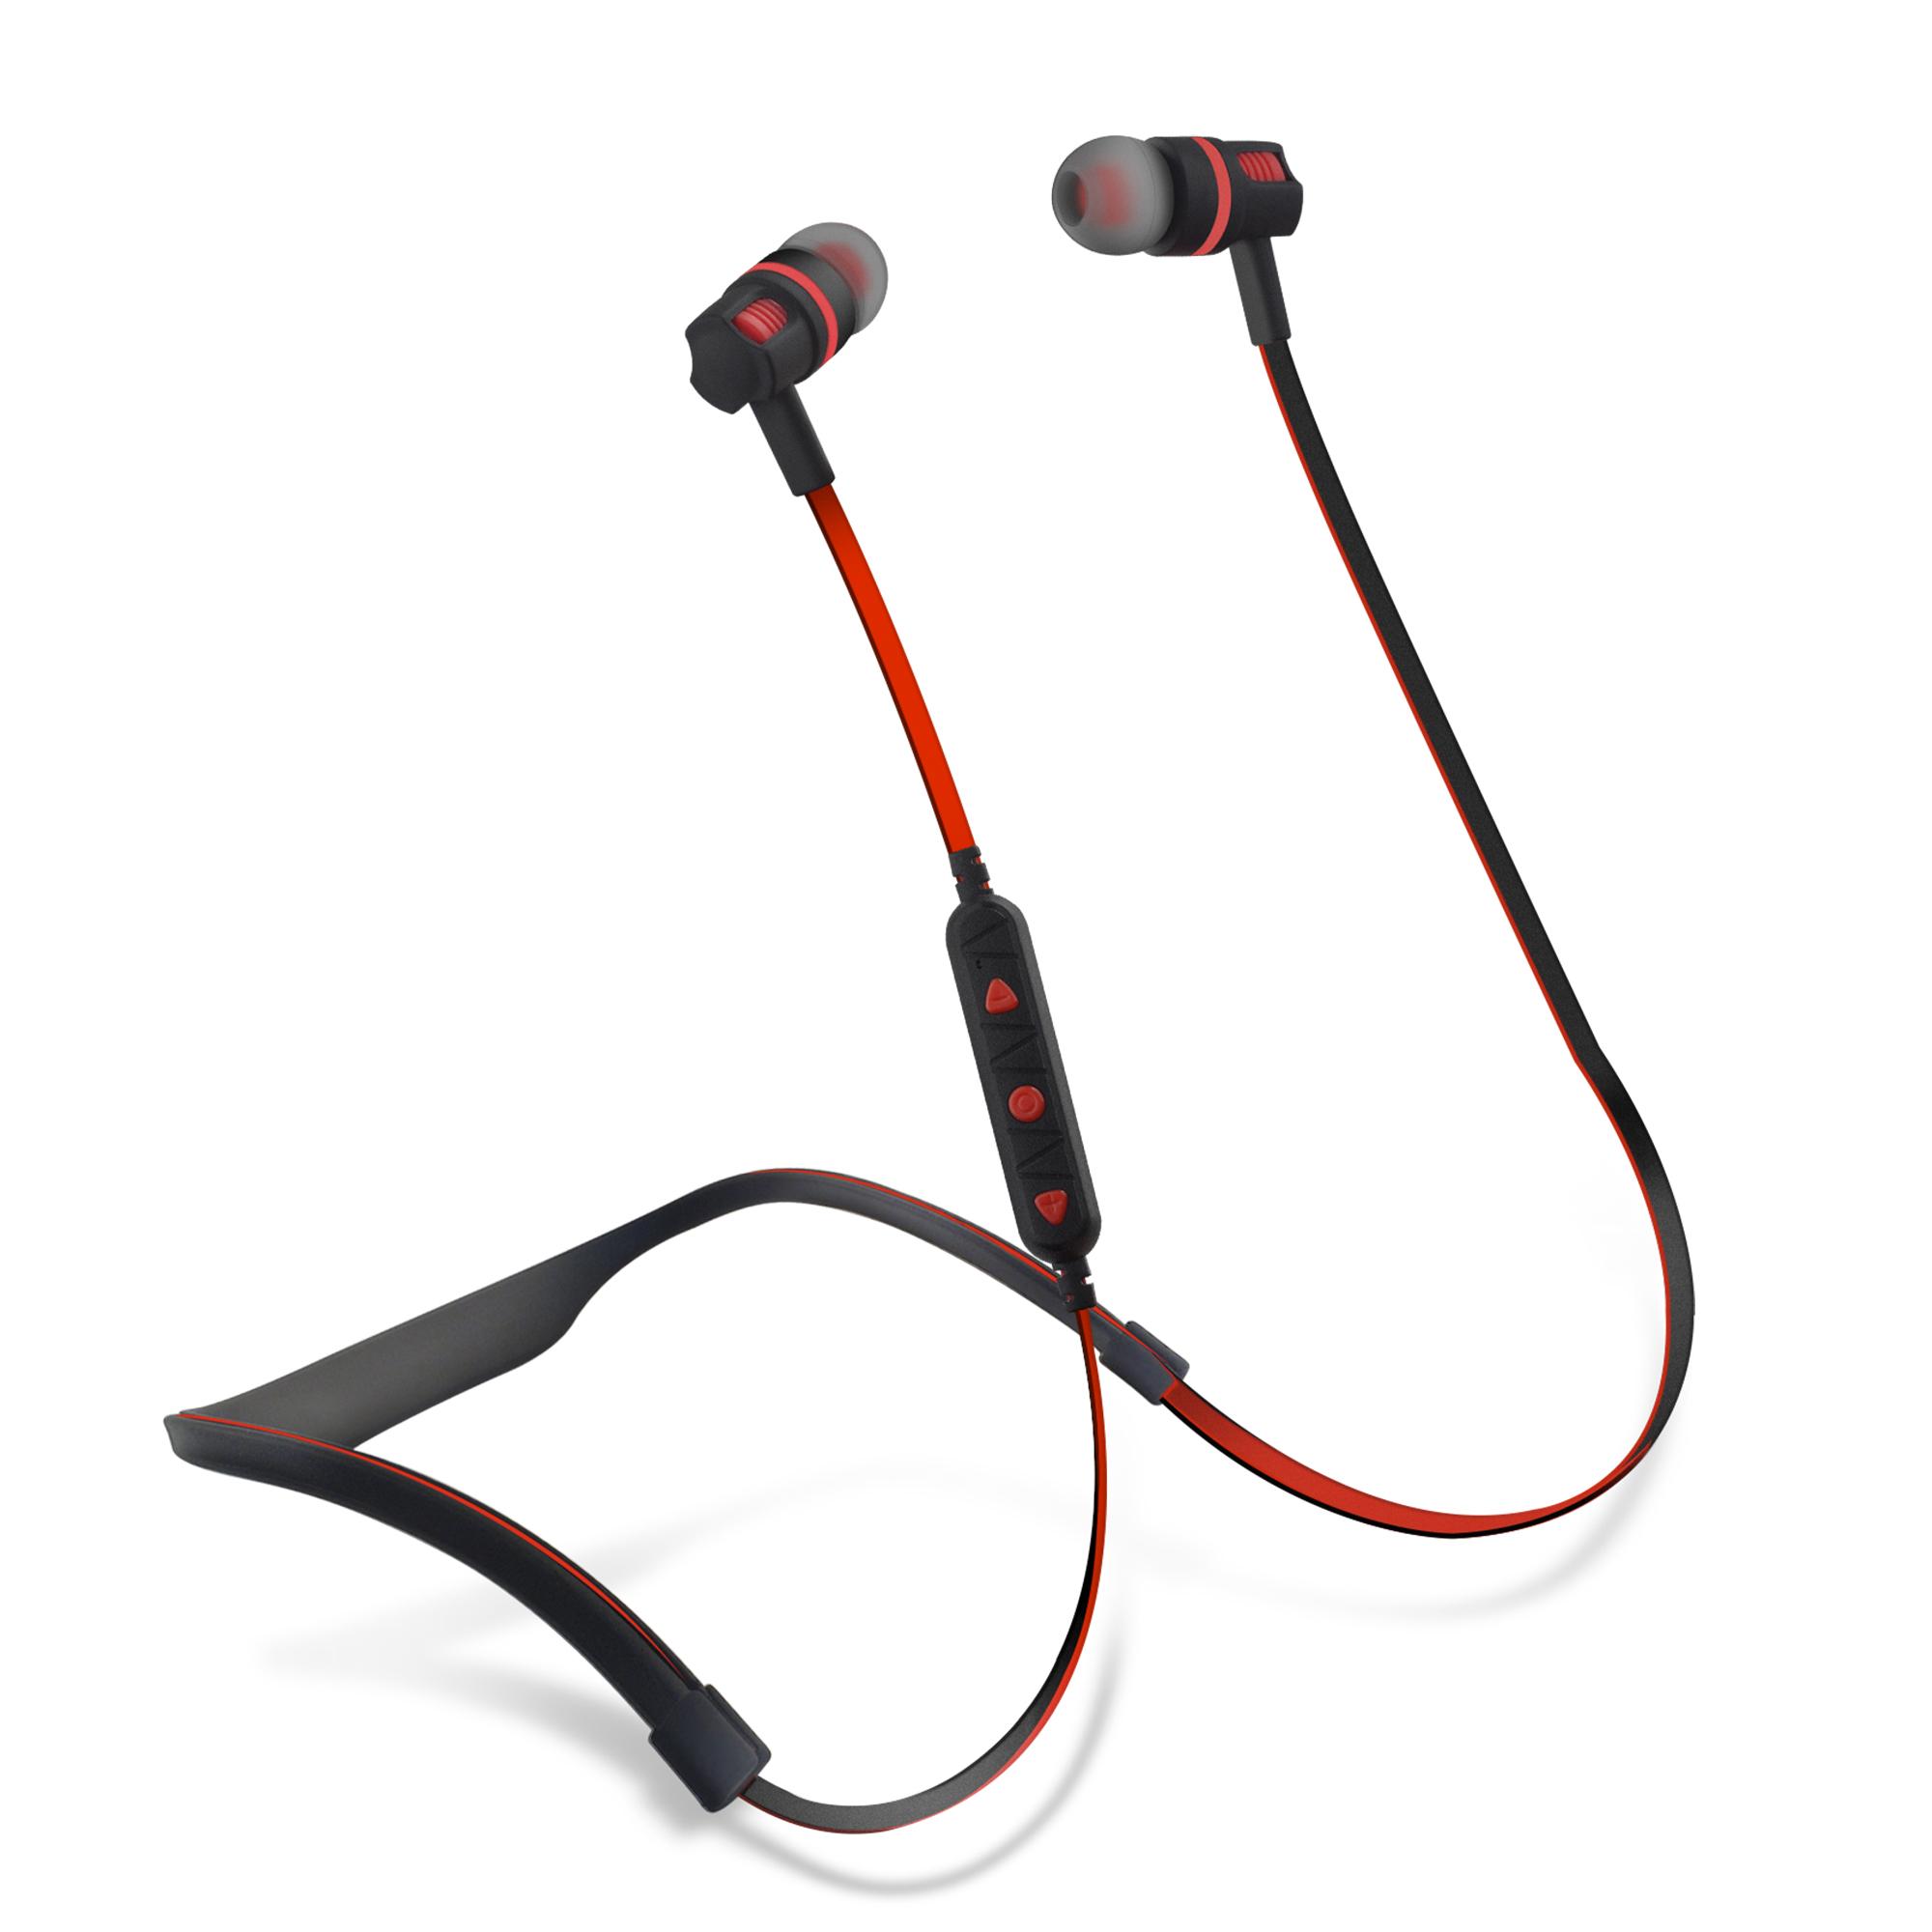 Neckband earphones bluetooth - earphones bluetooth single